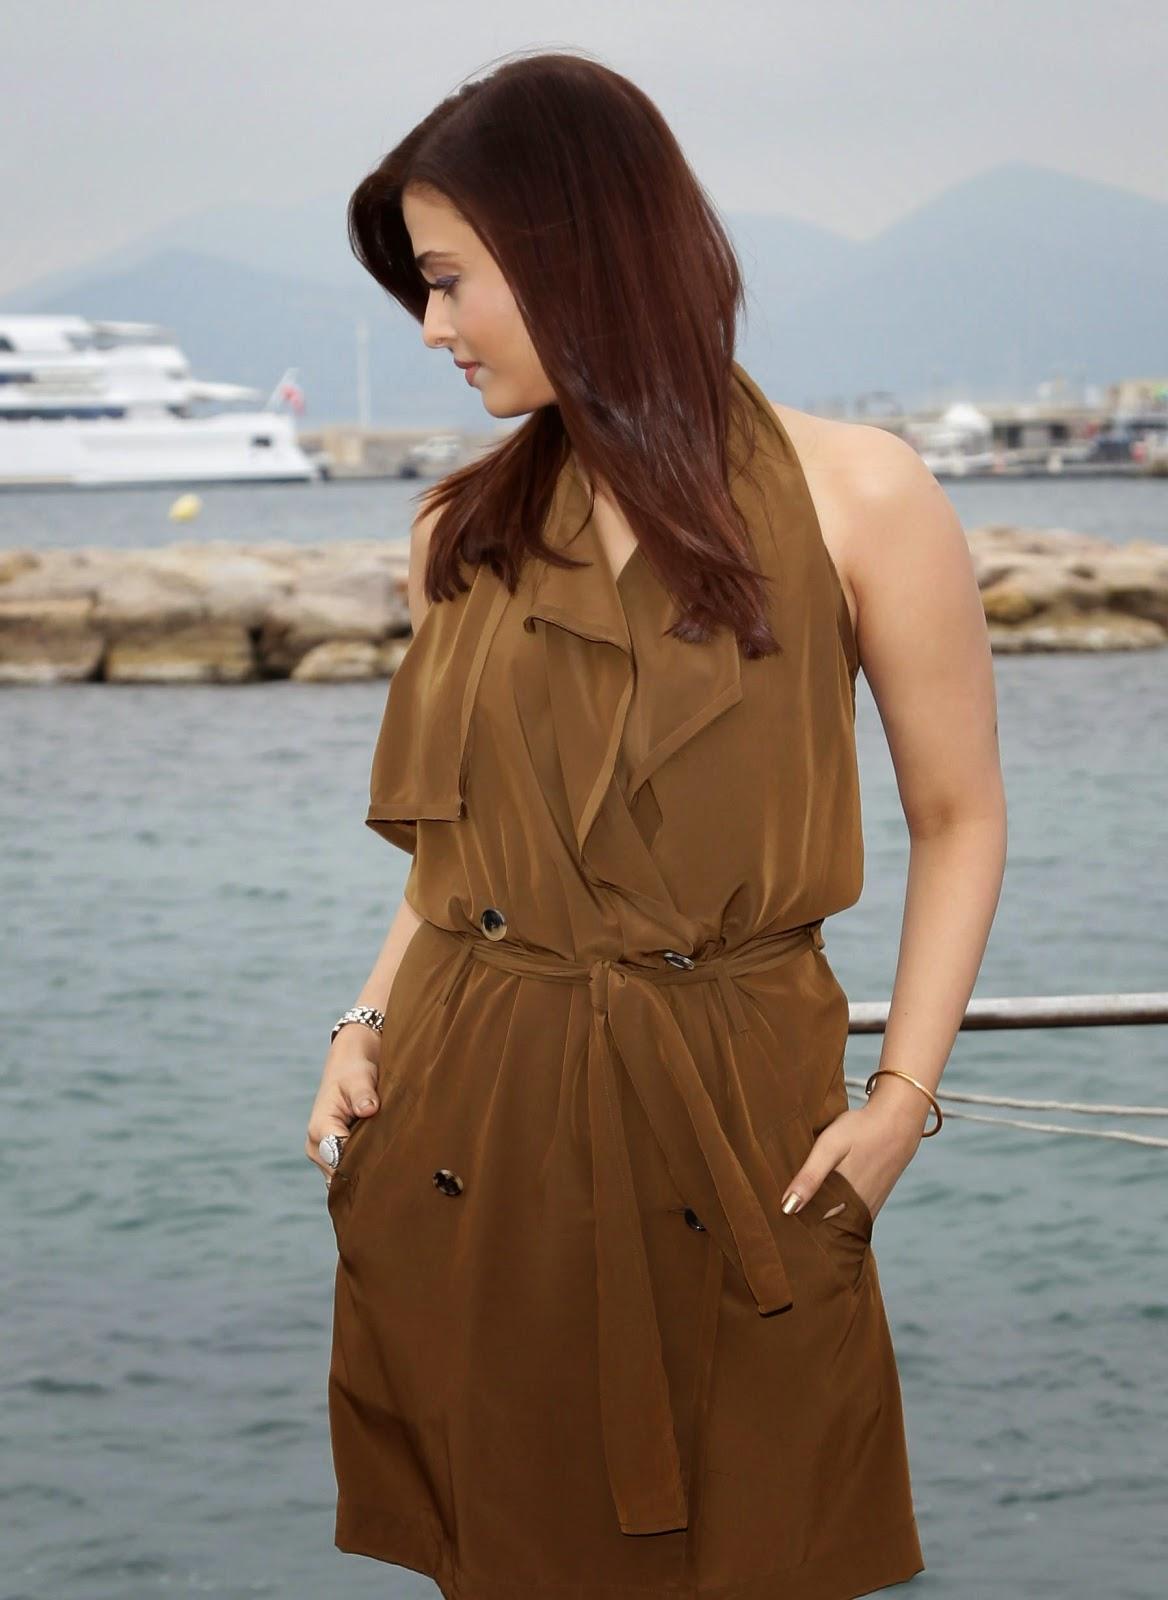 Aishwarya Rai Full HD Images - 64th Annual Cannes Film Festival - Photocall